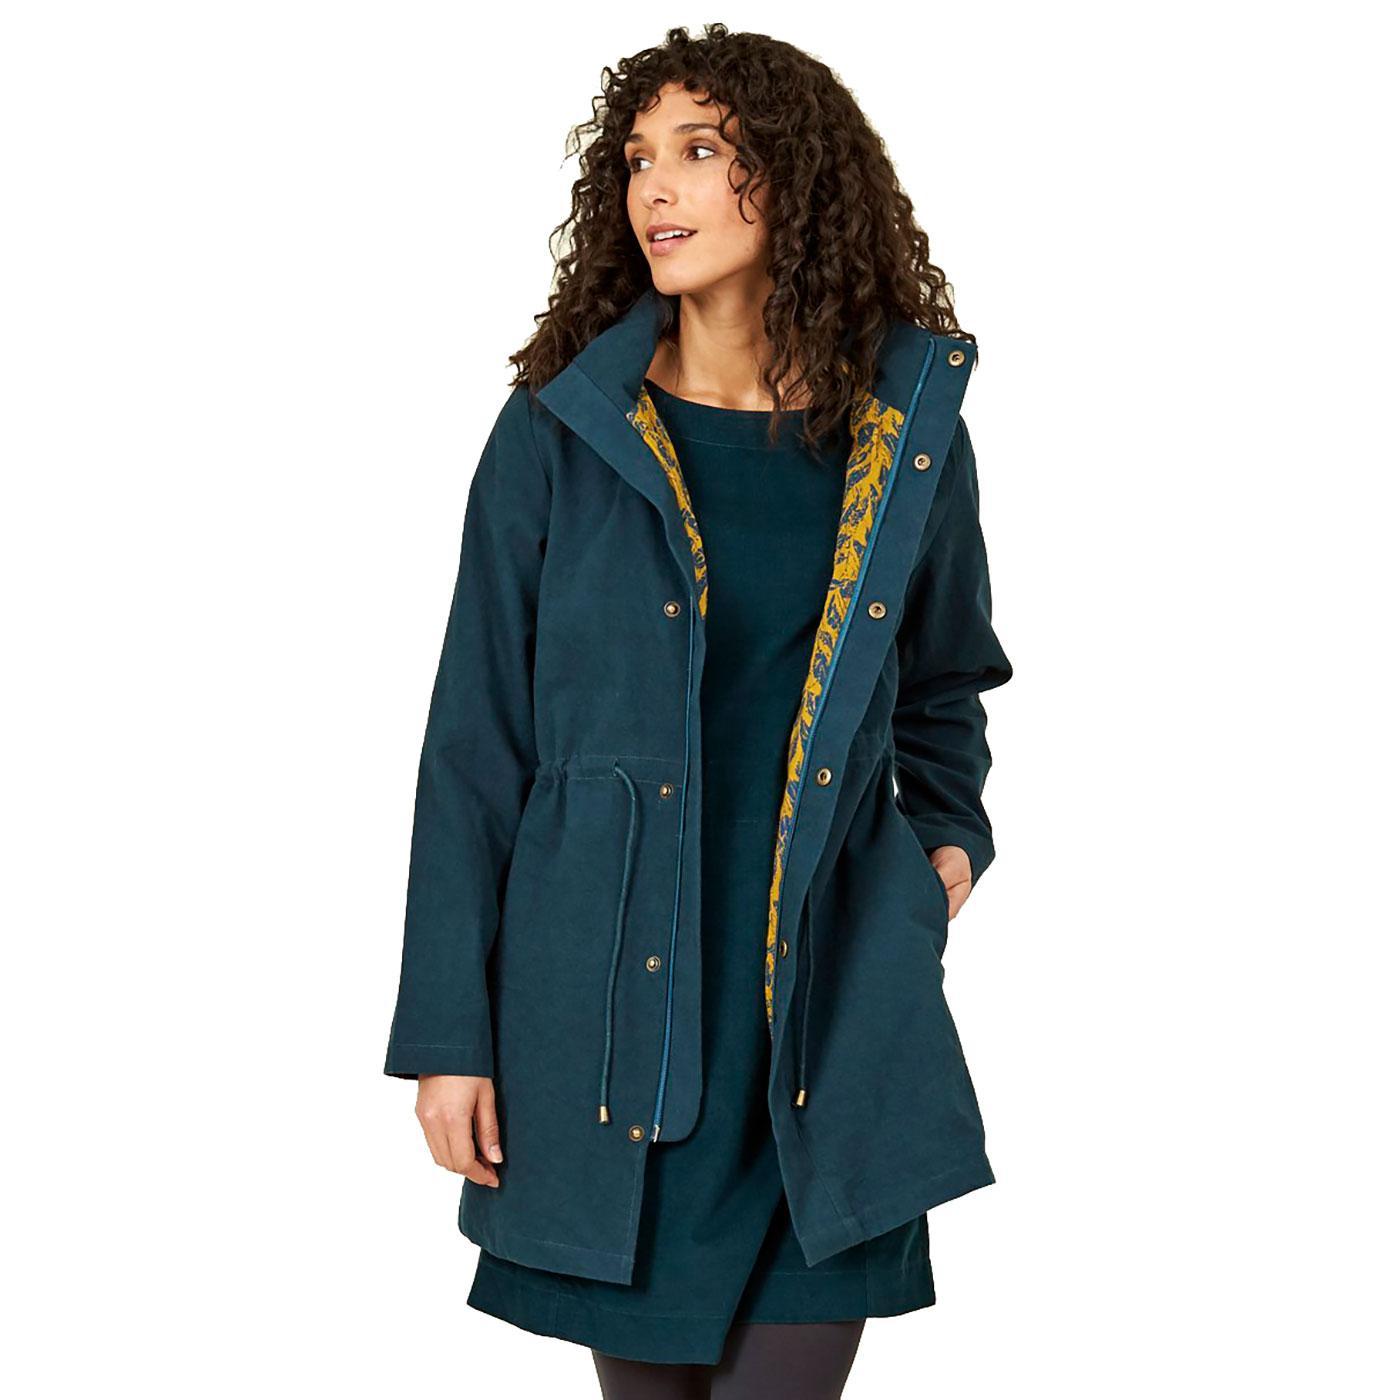 NOMADS Organic Retro Printed Lining Hooded Coat